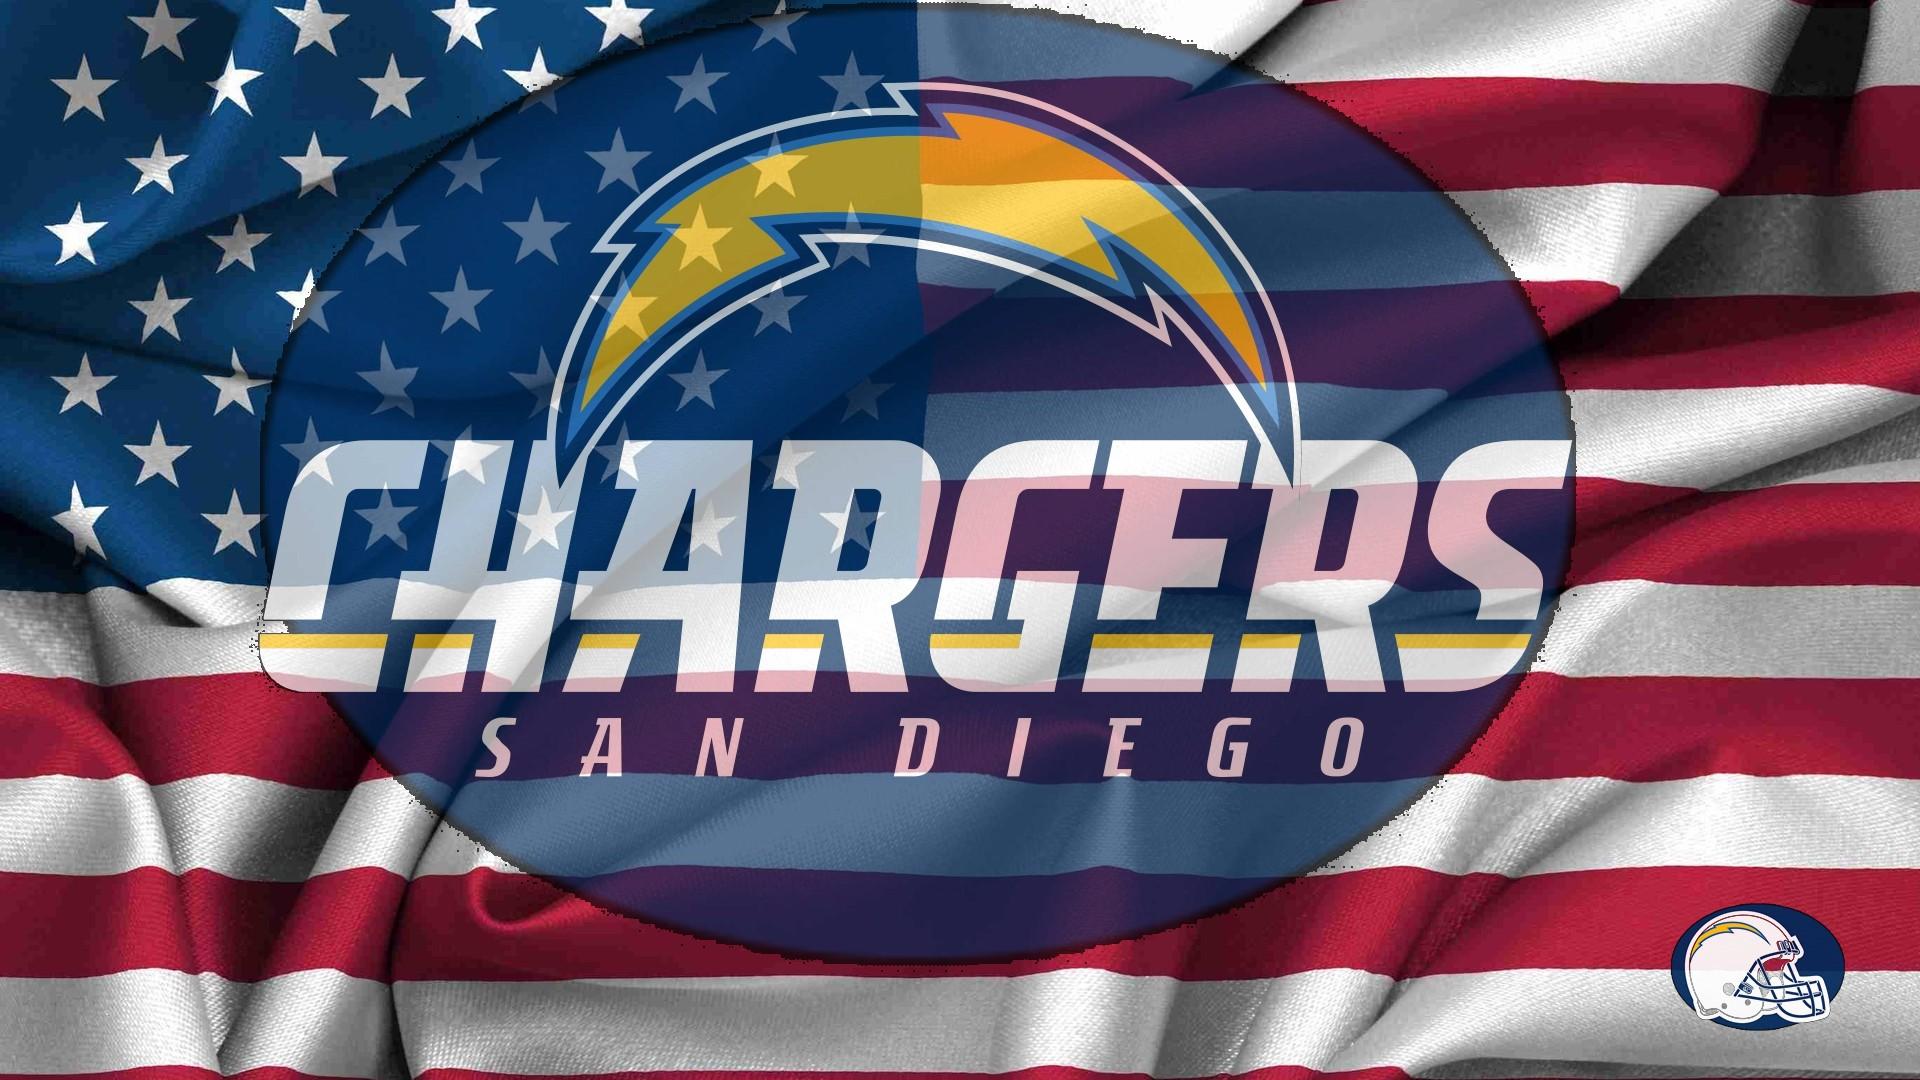 San Diego Chargers Logo 1920x1080